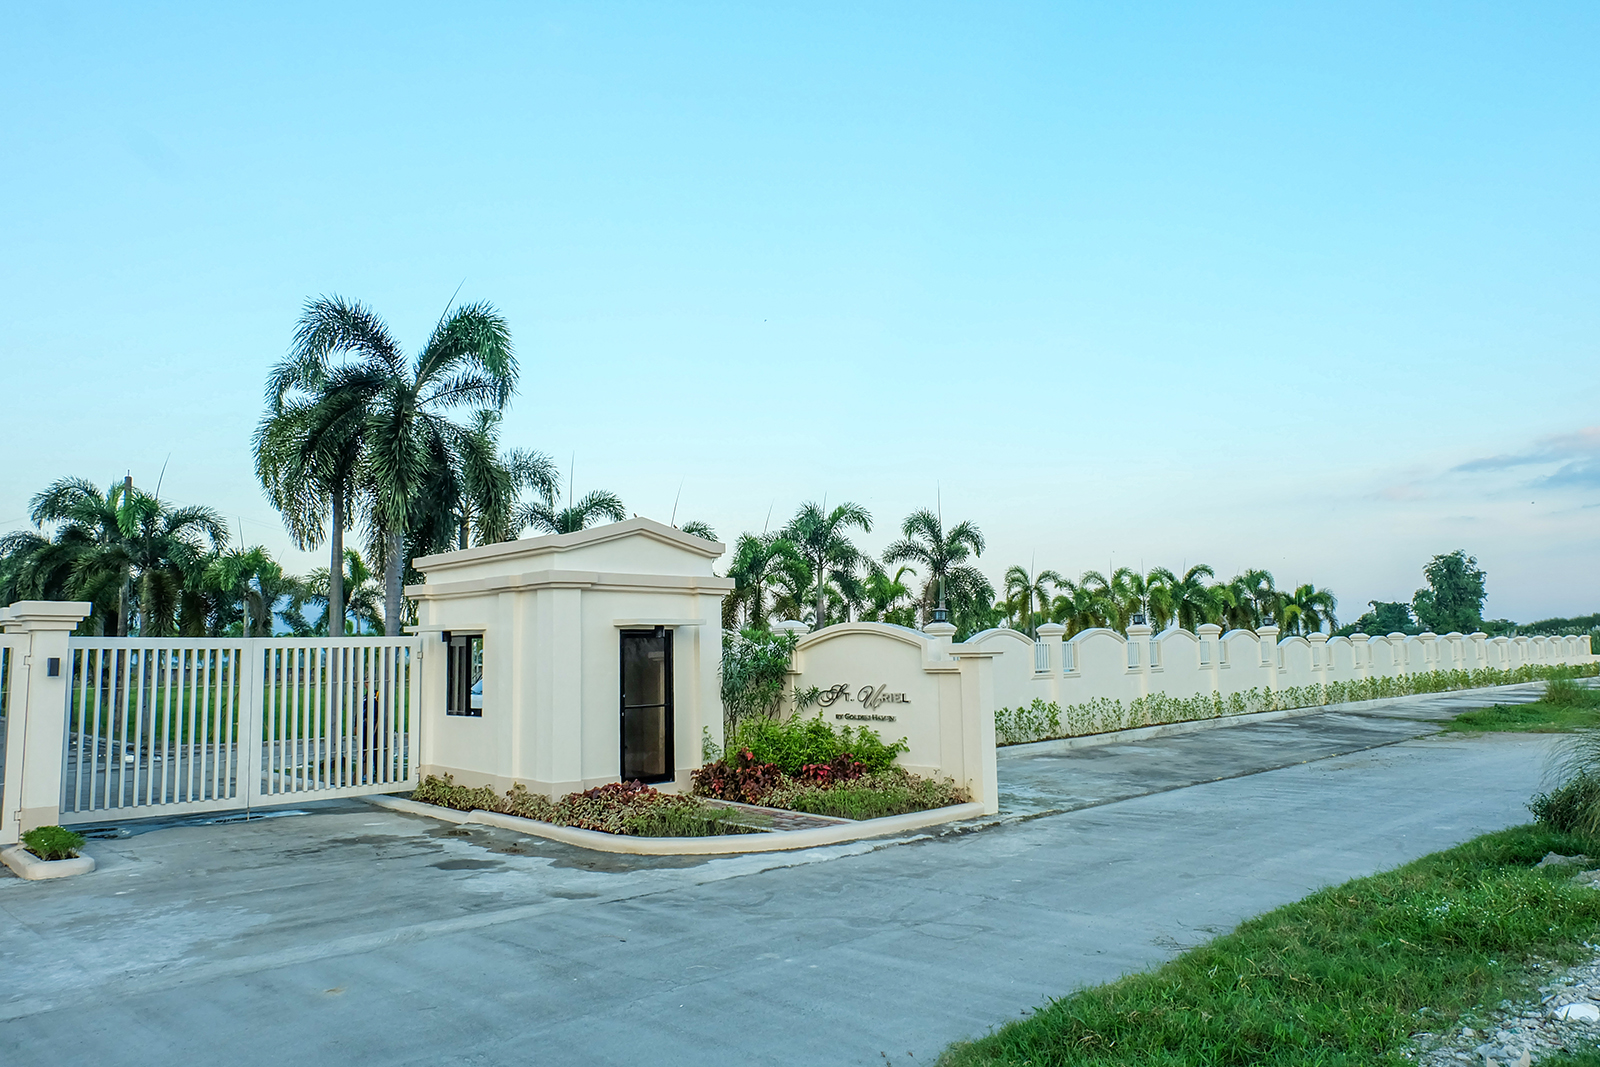 Golden Haven Memorial Parks combine elegant architecture with picturesque naturescapes.